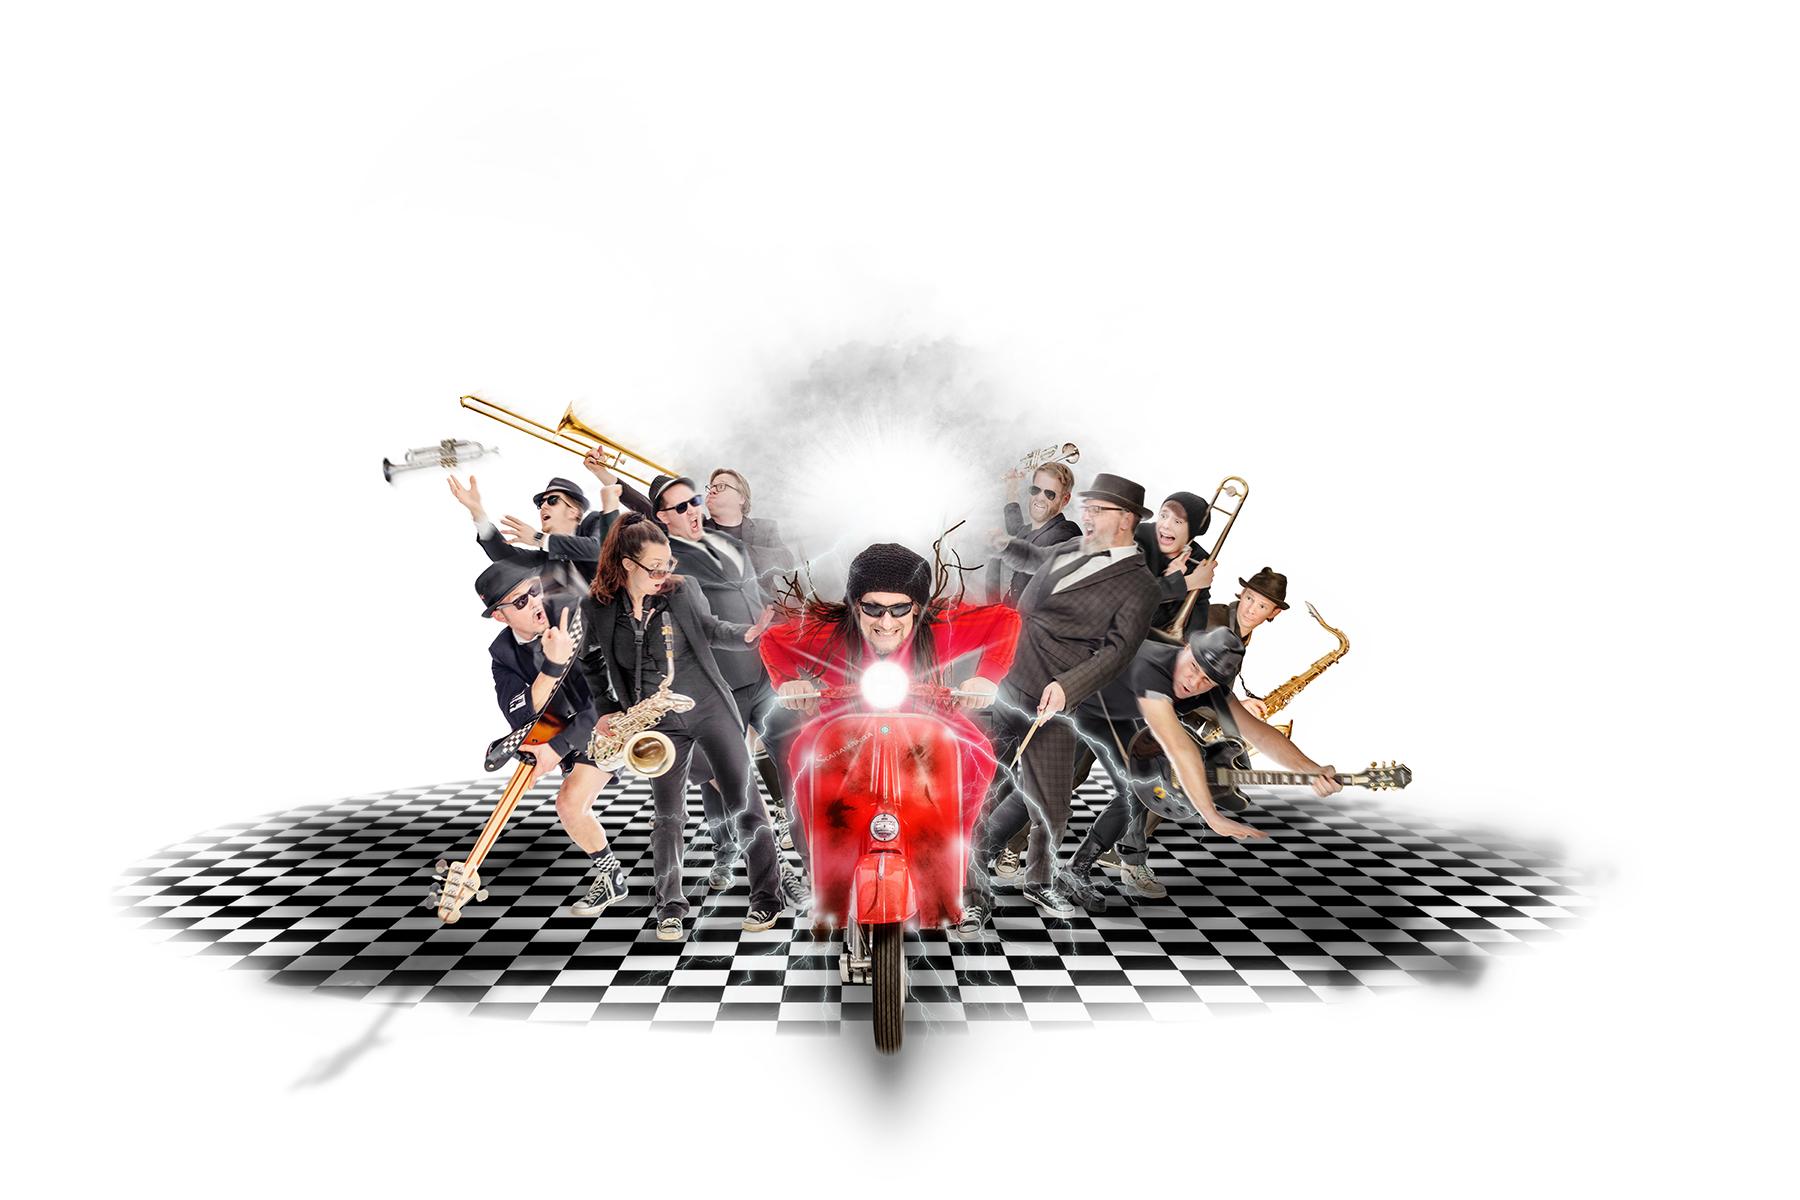 Ska, Skaramanga, Band, Hamburg, Bergedorf, Veranstaltungstipp, Ska Ska, Hey you, Lola Kulturzentrum, Fun